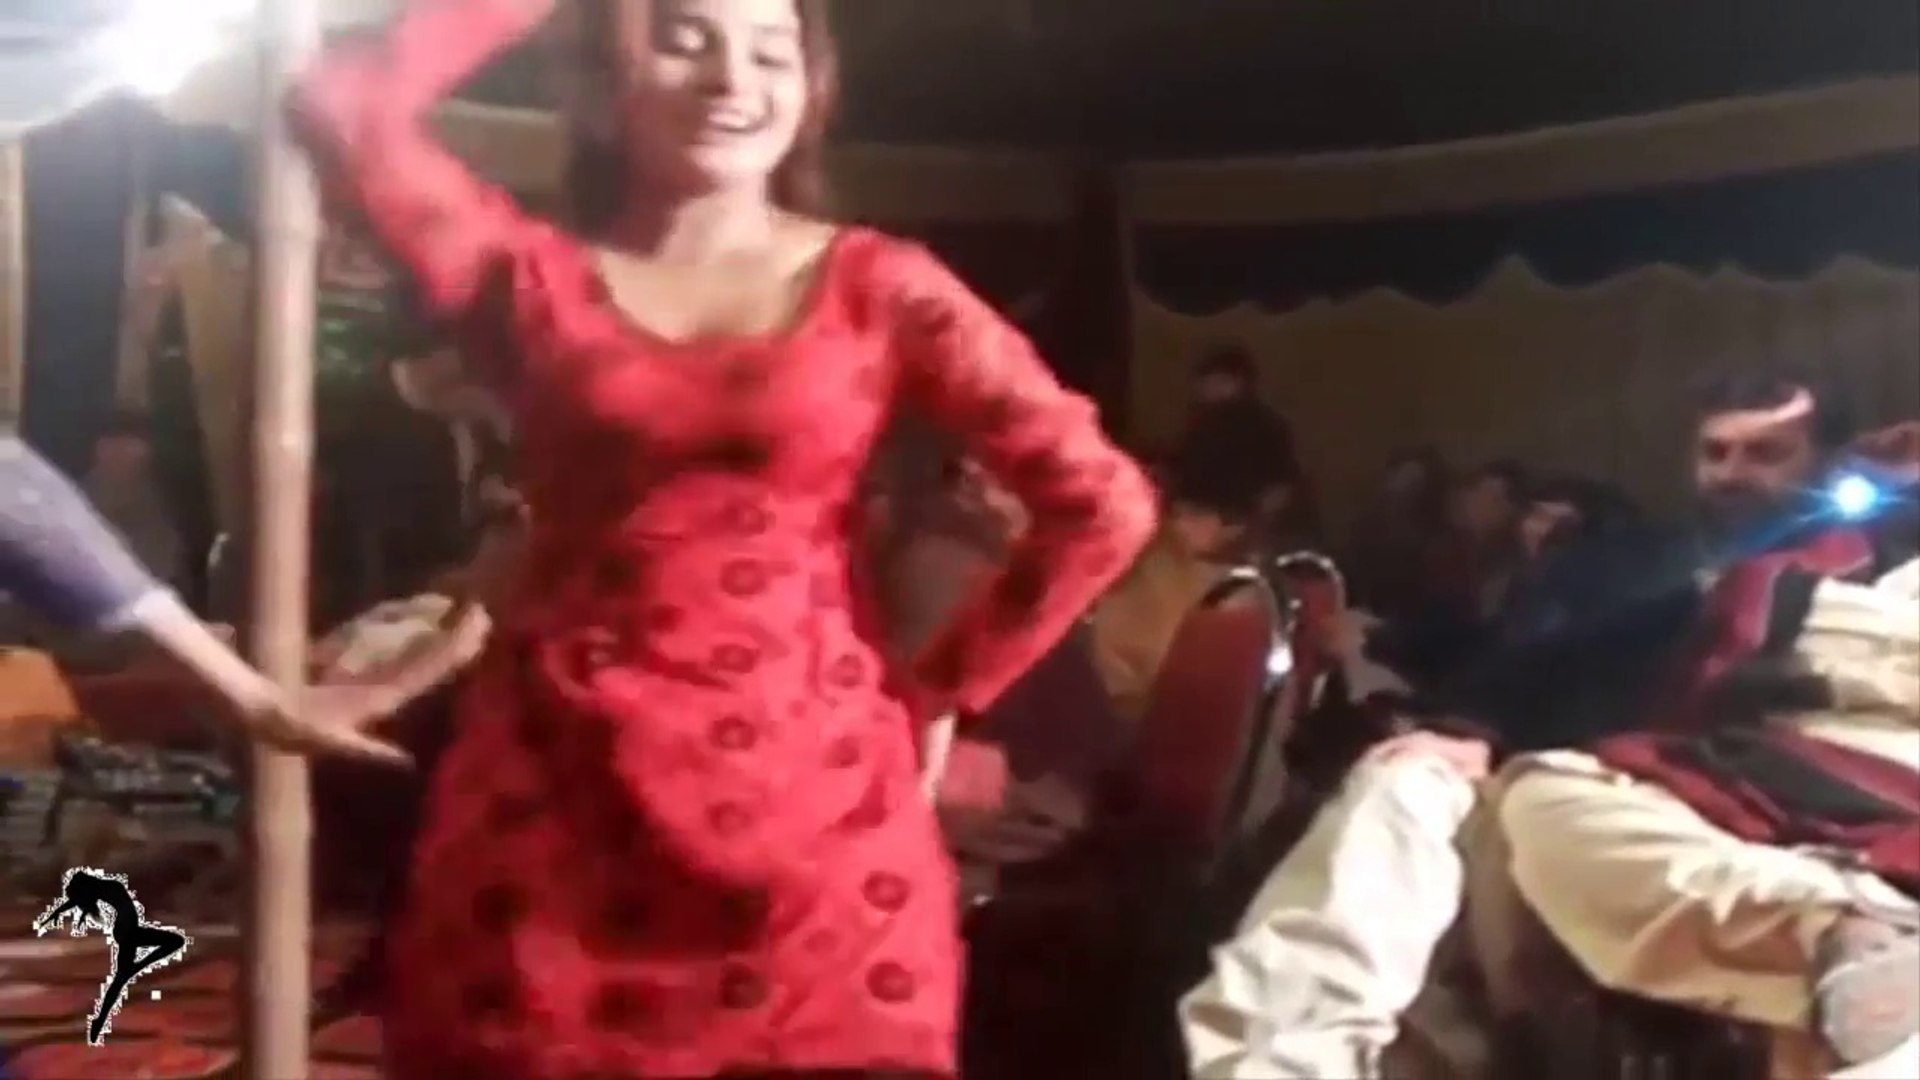 ANAM RANA VERY BEAUTIFUL DANCE AT PRIVATE PARTY,VERY BEAUTIFUL RED DRESS,AMZAING DANCE,BEAUTIFUL ANA